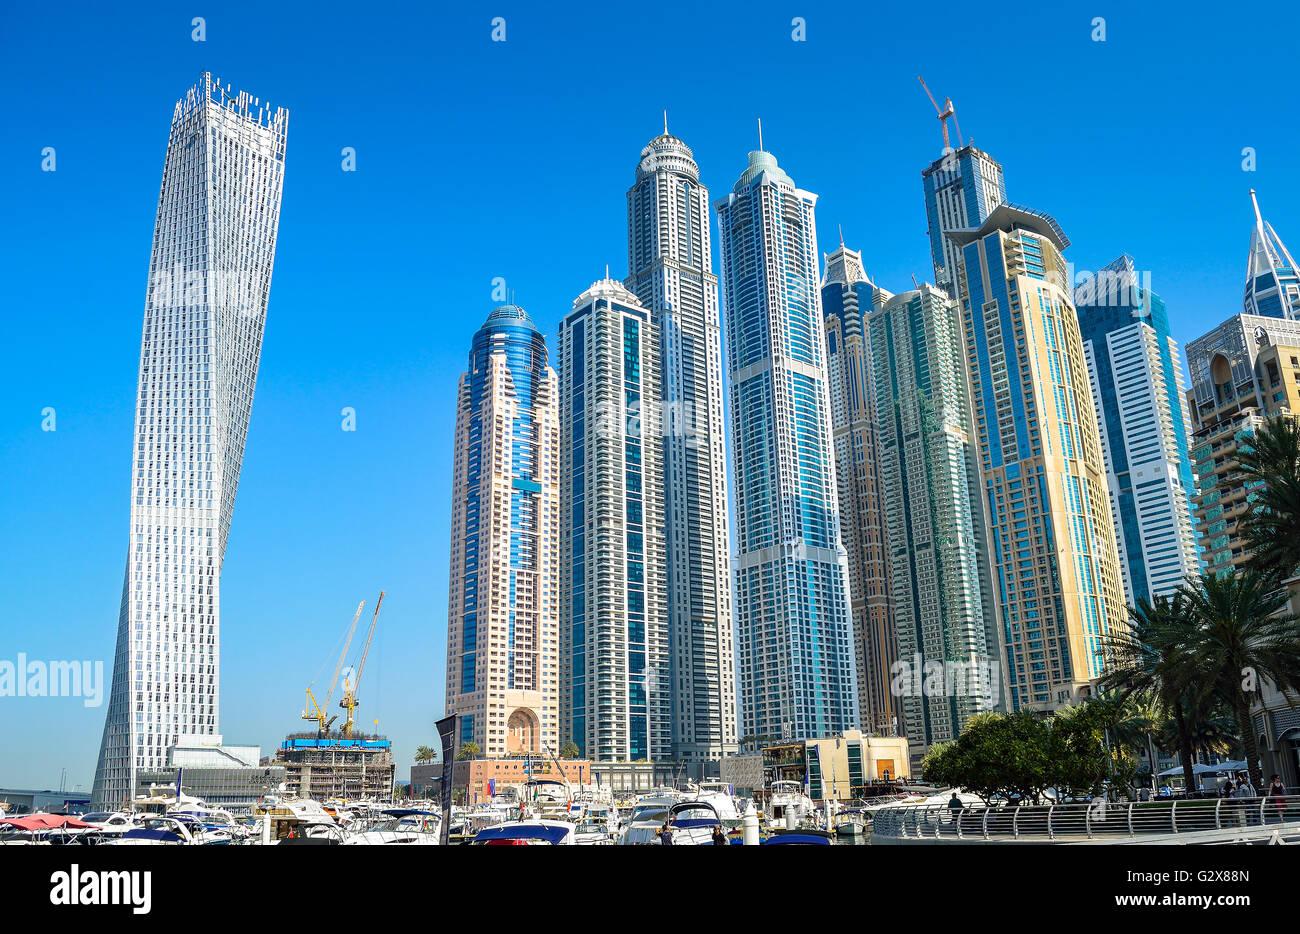 Skyscrapers in Dubai Marina UAE. - Stock Image